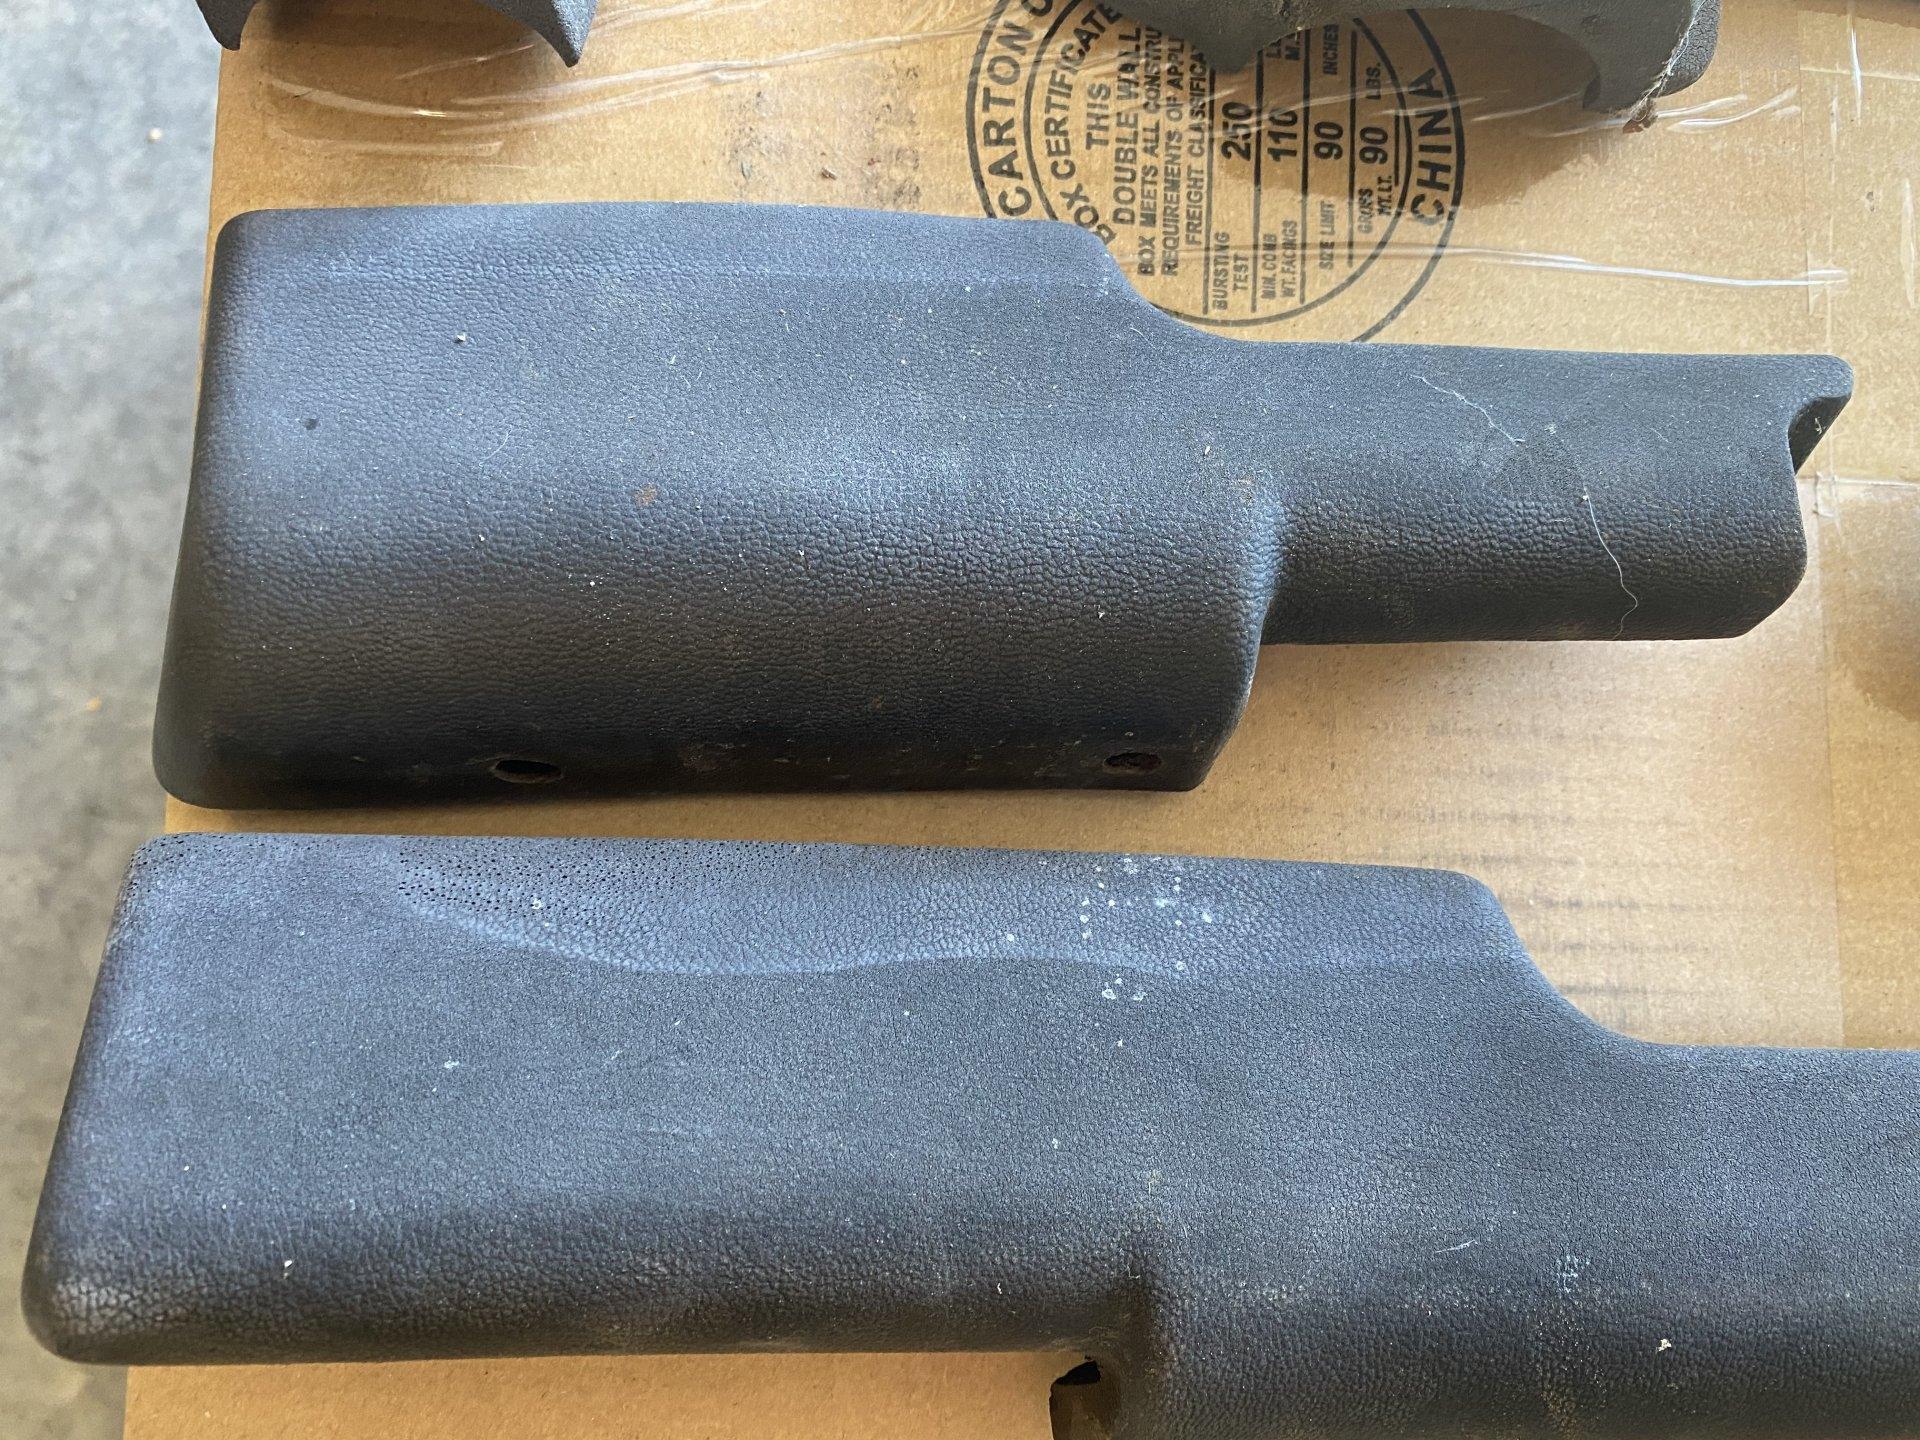 DF7E5B43-1DC4-4AA3-8C33-335C3764C6AB.jpeg